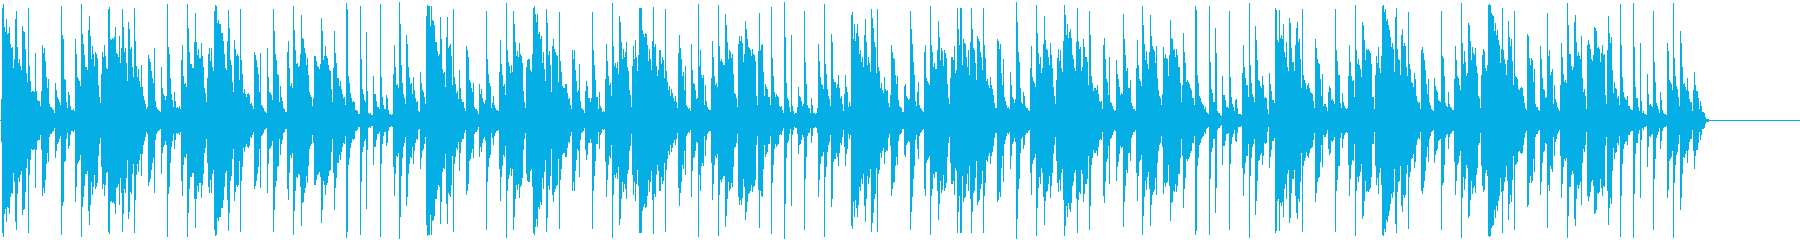 BGM_ステージセレクトAの再生済みの波形